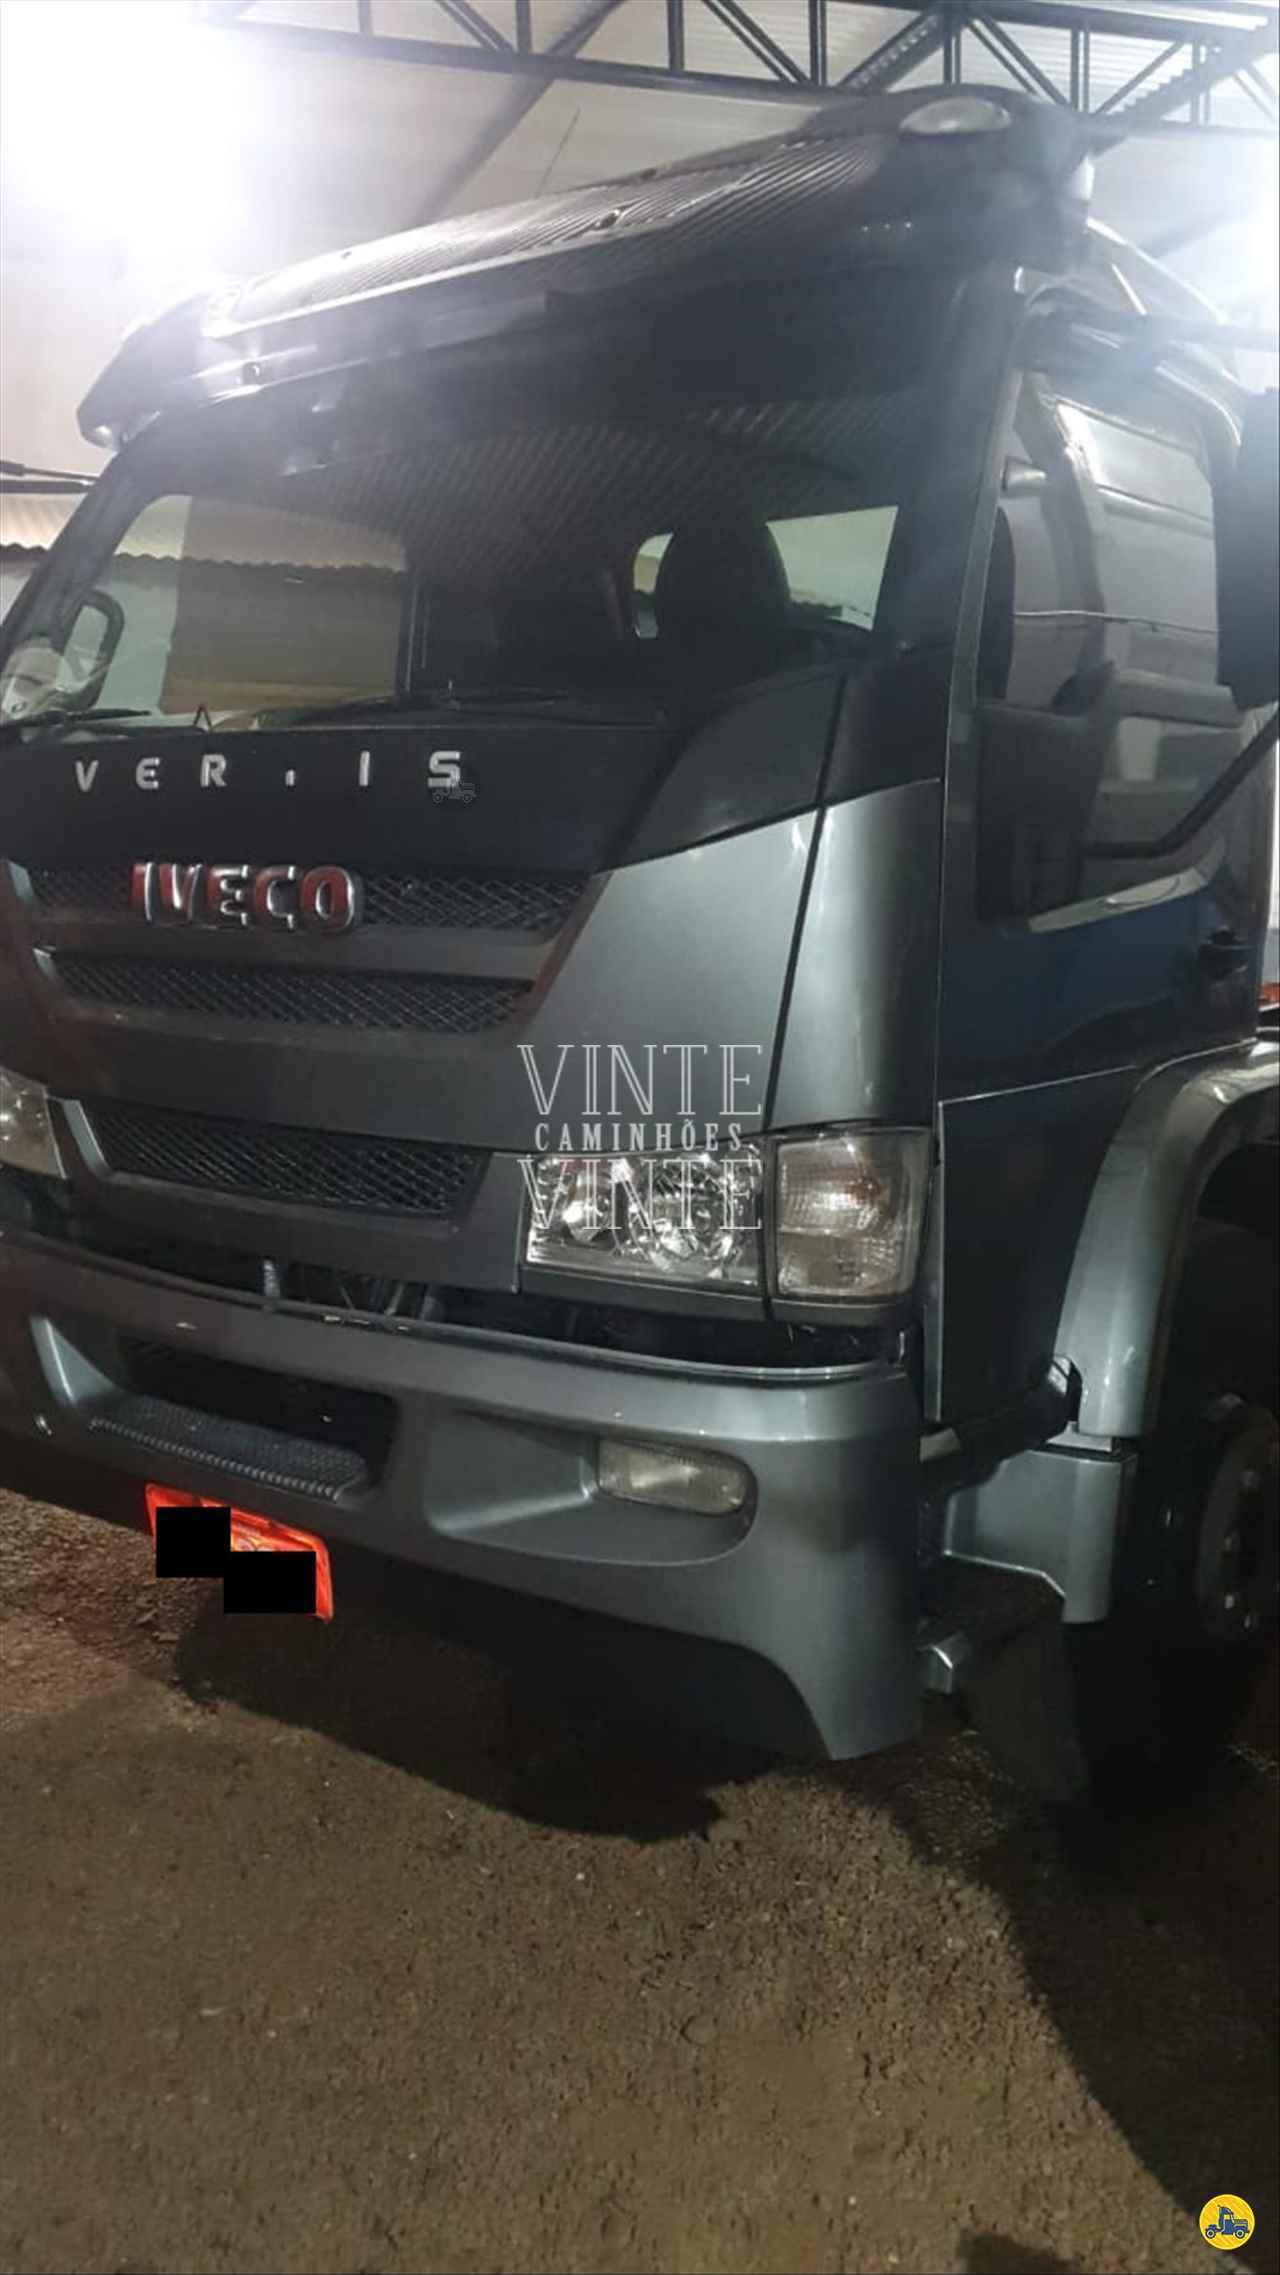 CAMINHAO IVECO VERTIS HD130V19 Chassis Toco 4x2 Vinte-Vinte Caminhões SANTO ANDRE SÃO PAULO SP